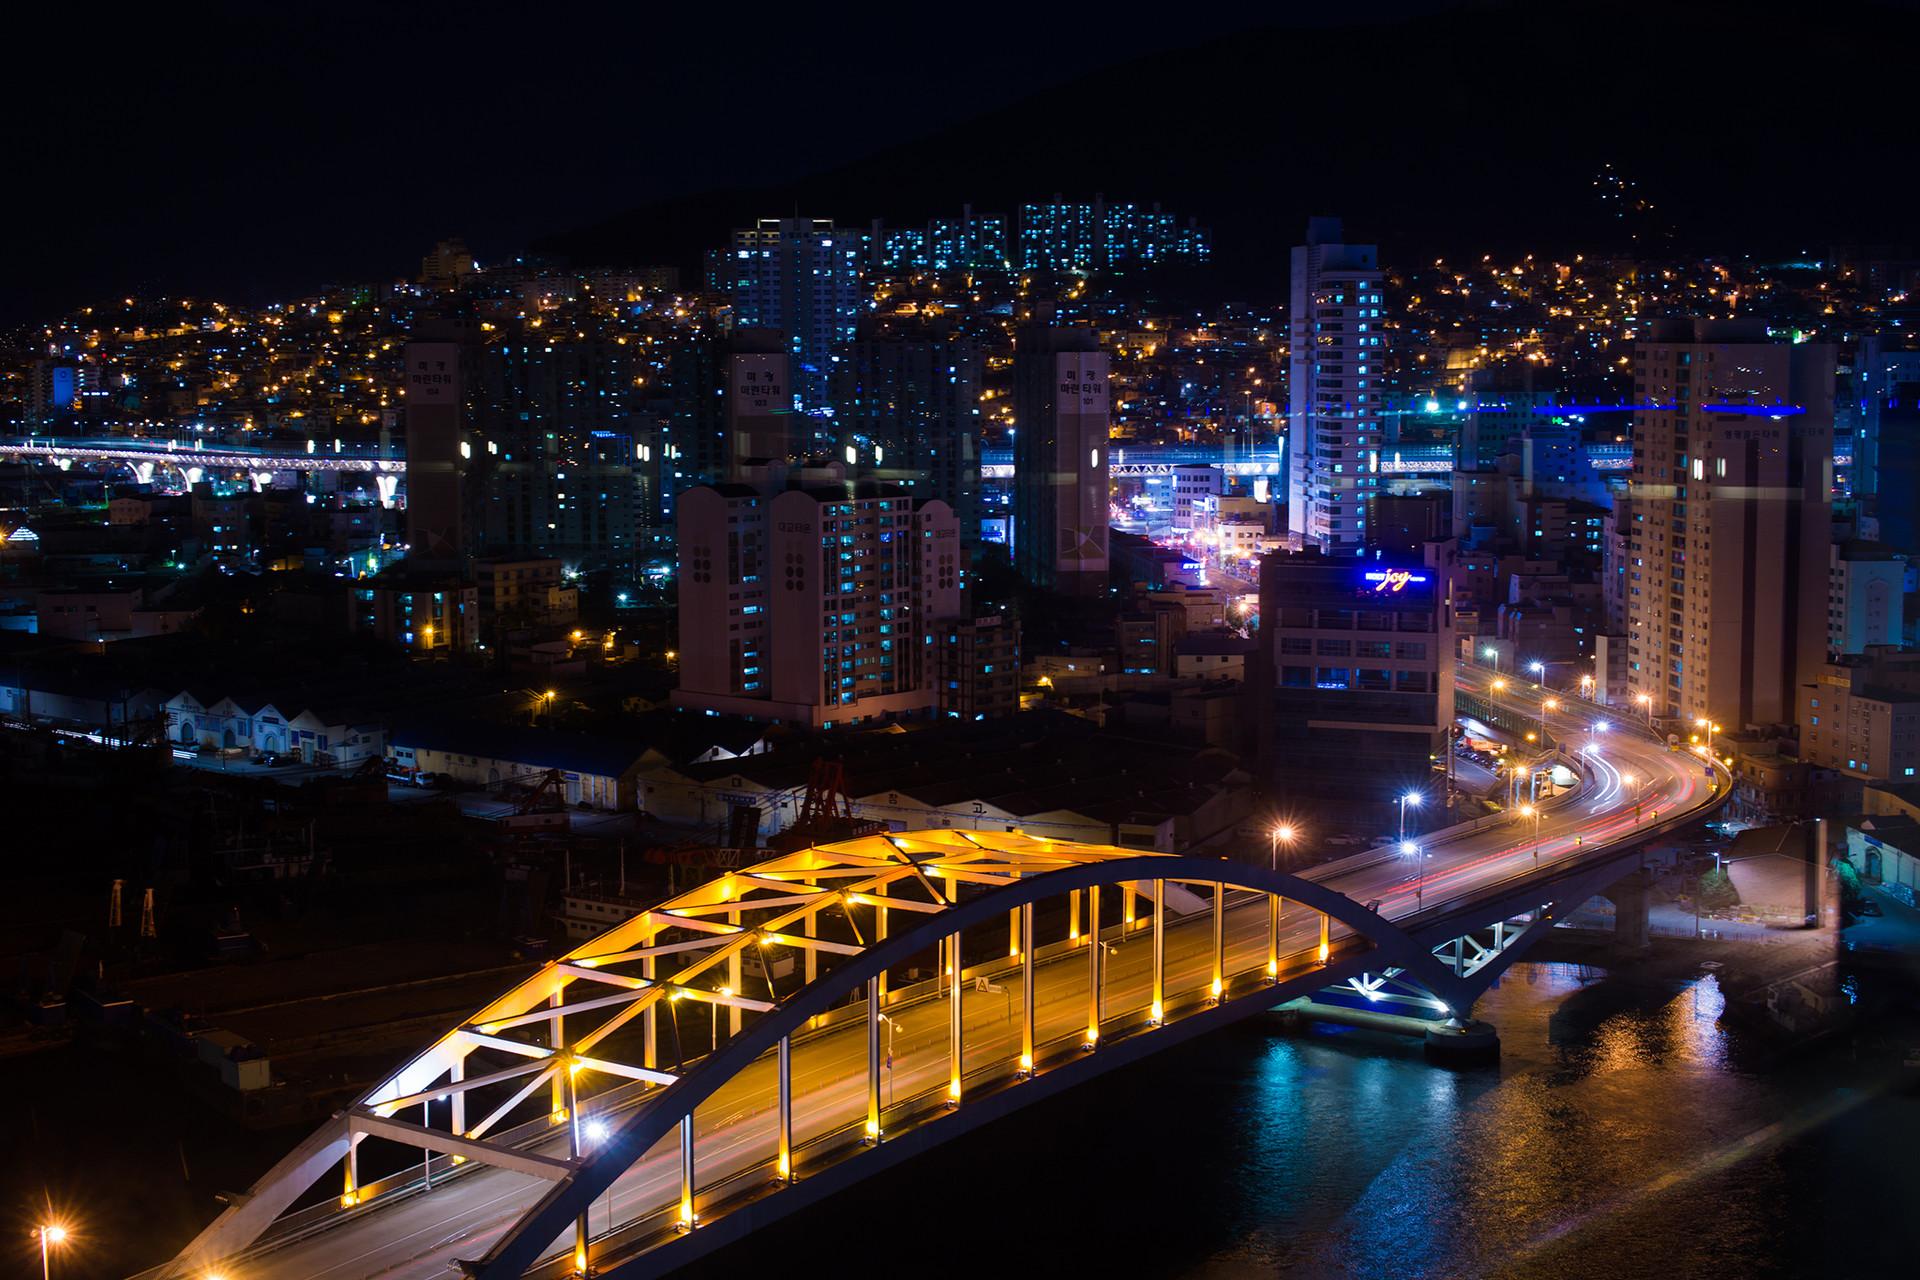 Busan Night Bridge Nightscape Cityscape Korea Travel Trip Malaysia Kuala Lumpur Melaka Johor Photography Top Best  Photographer 韓國 旅行 釜山